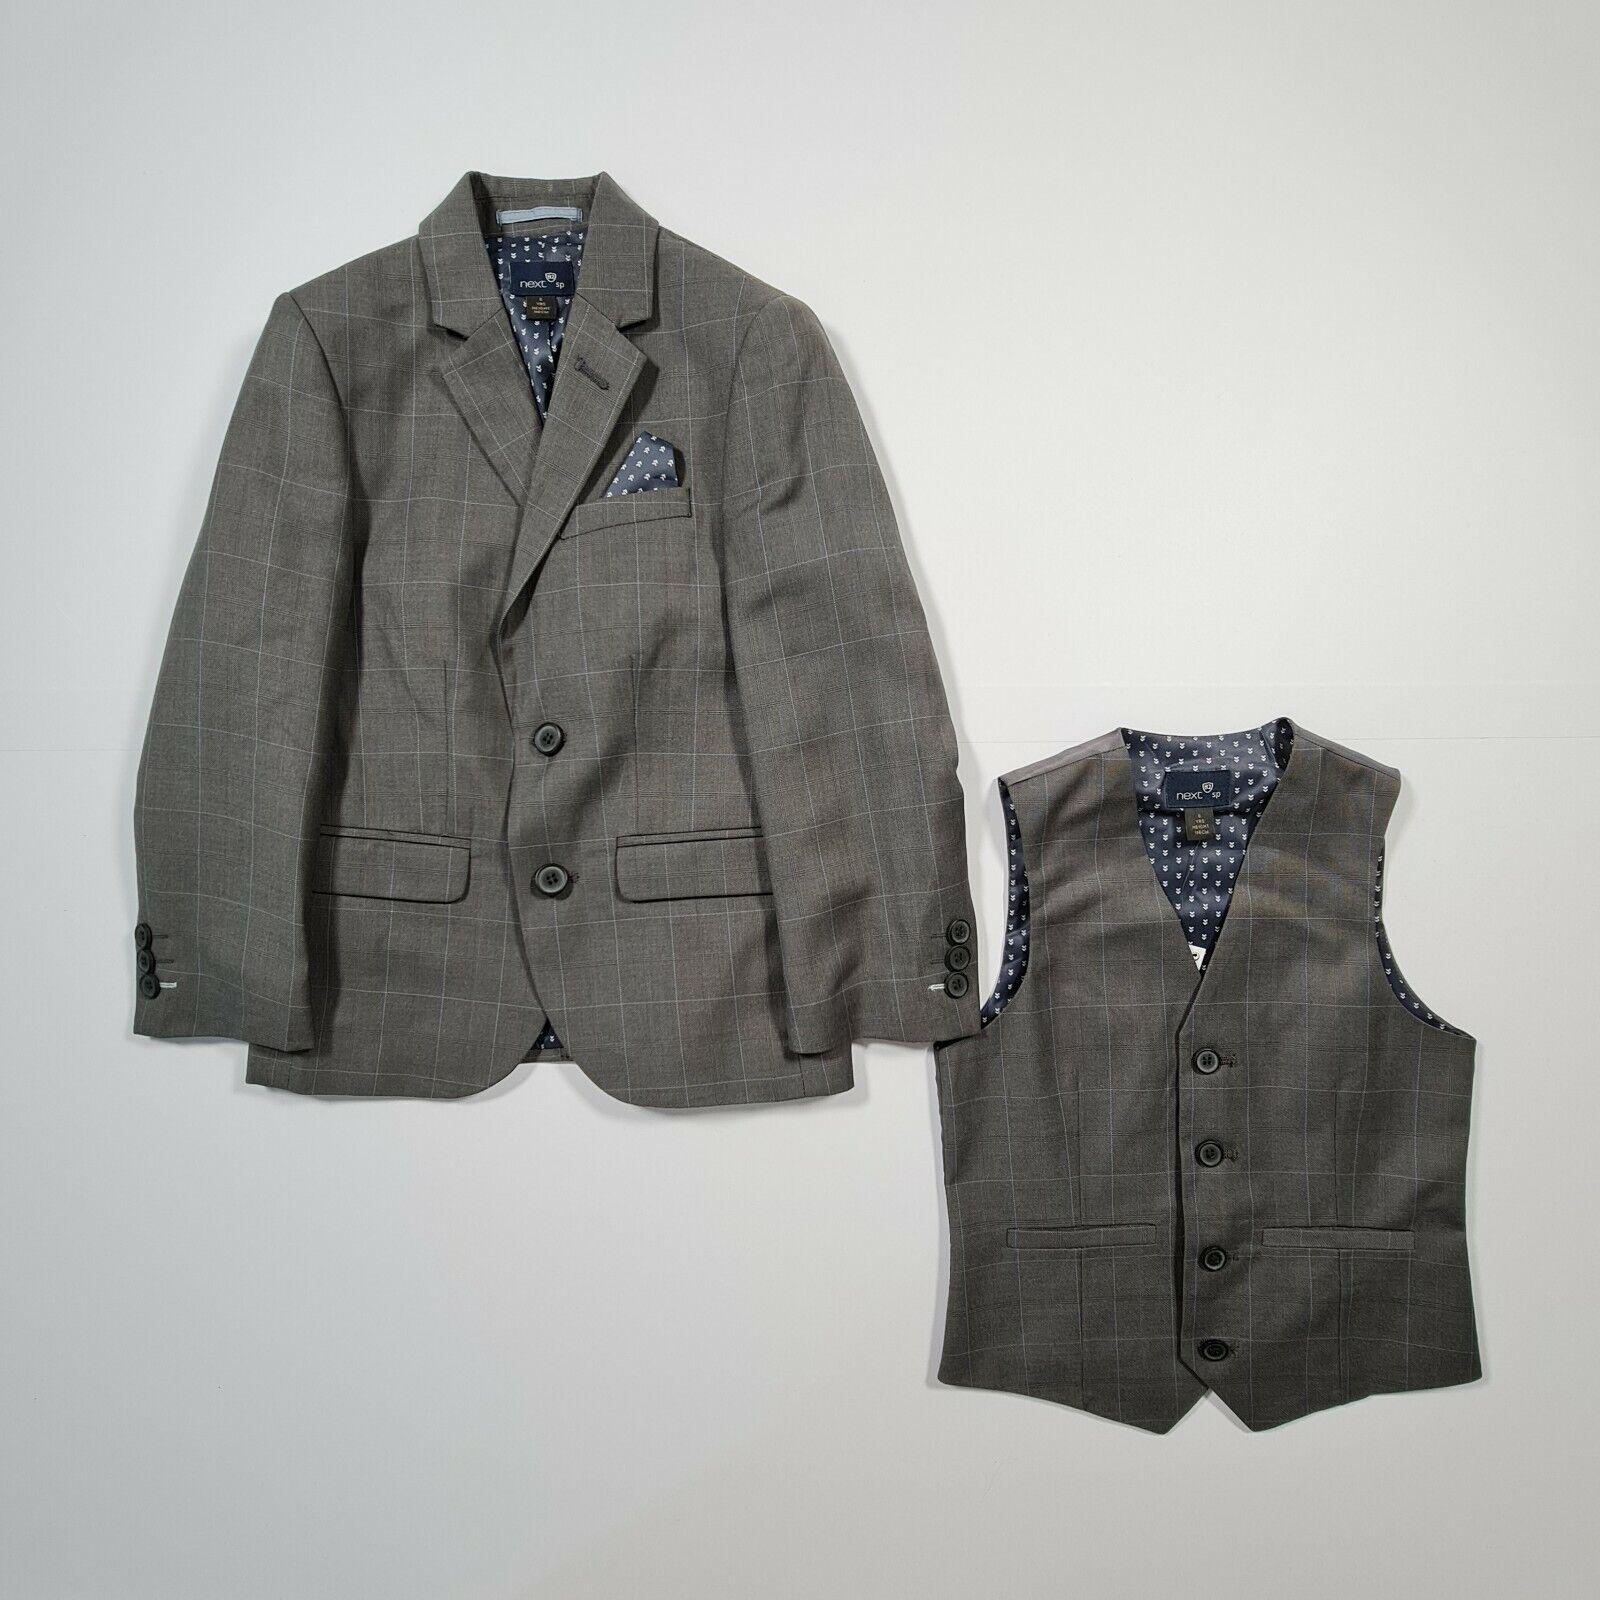 NEXT Boys Grey Check Pattern Twill Suit Jacket & Waistcoat Age 6 Years